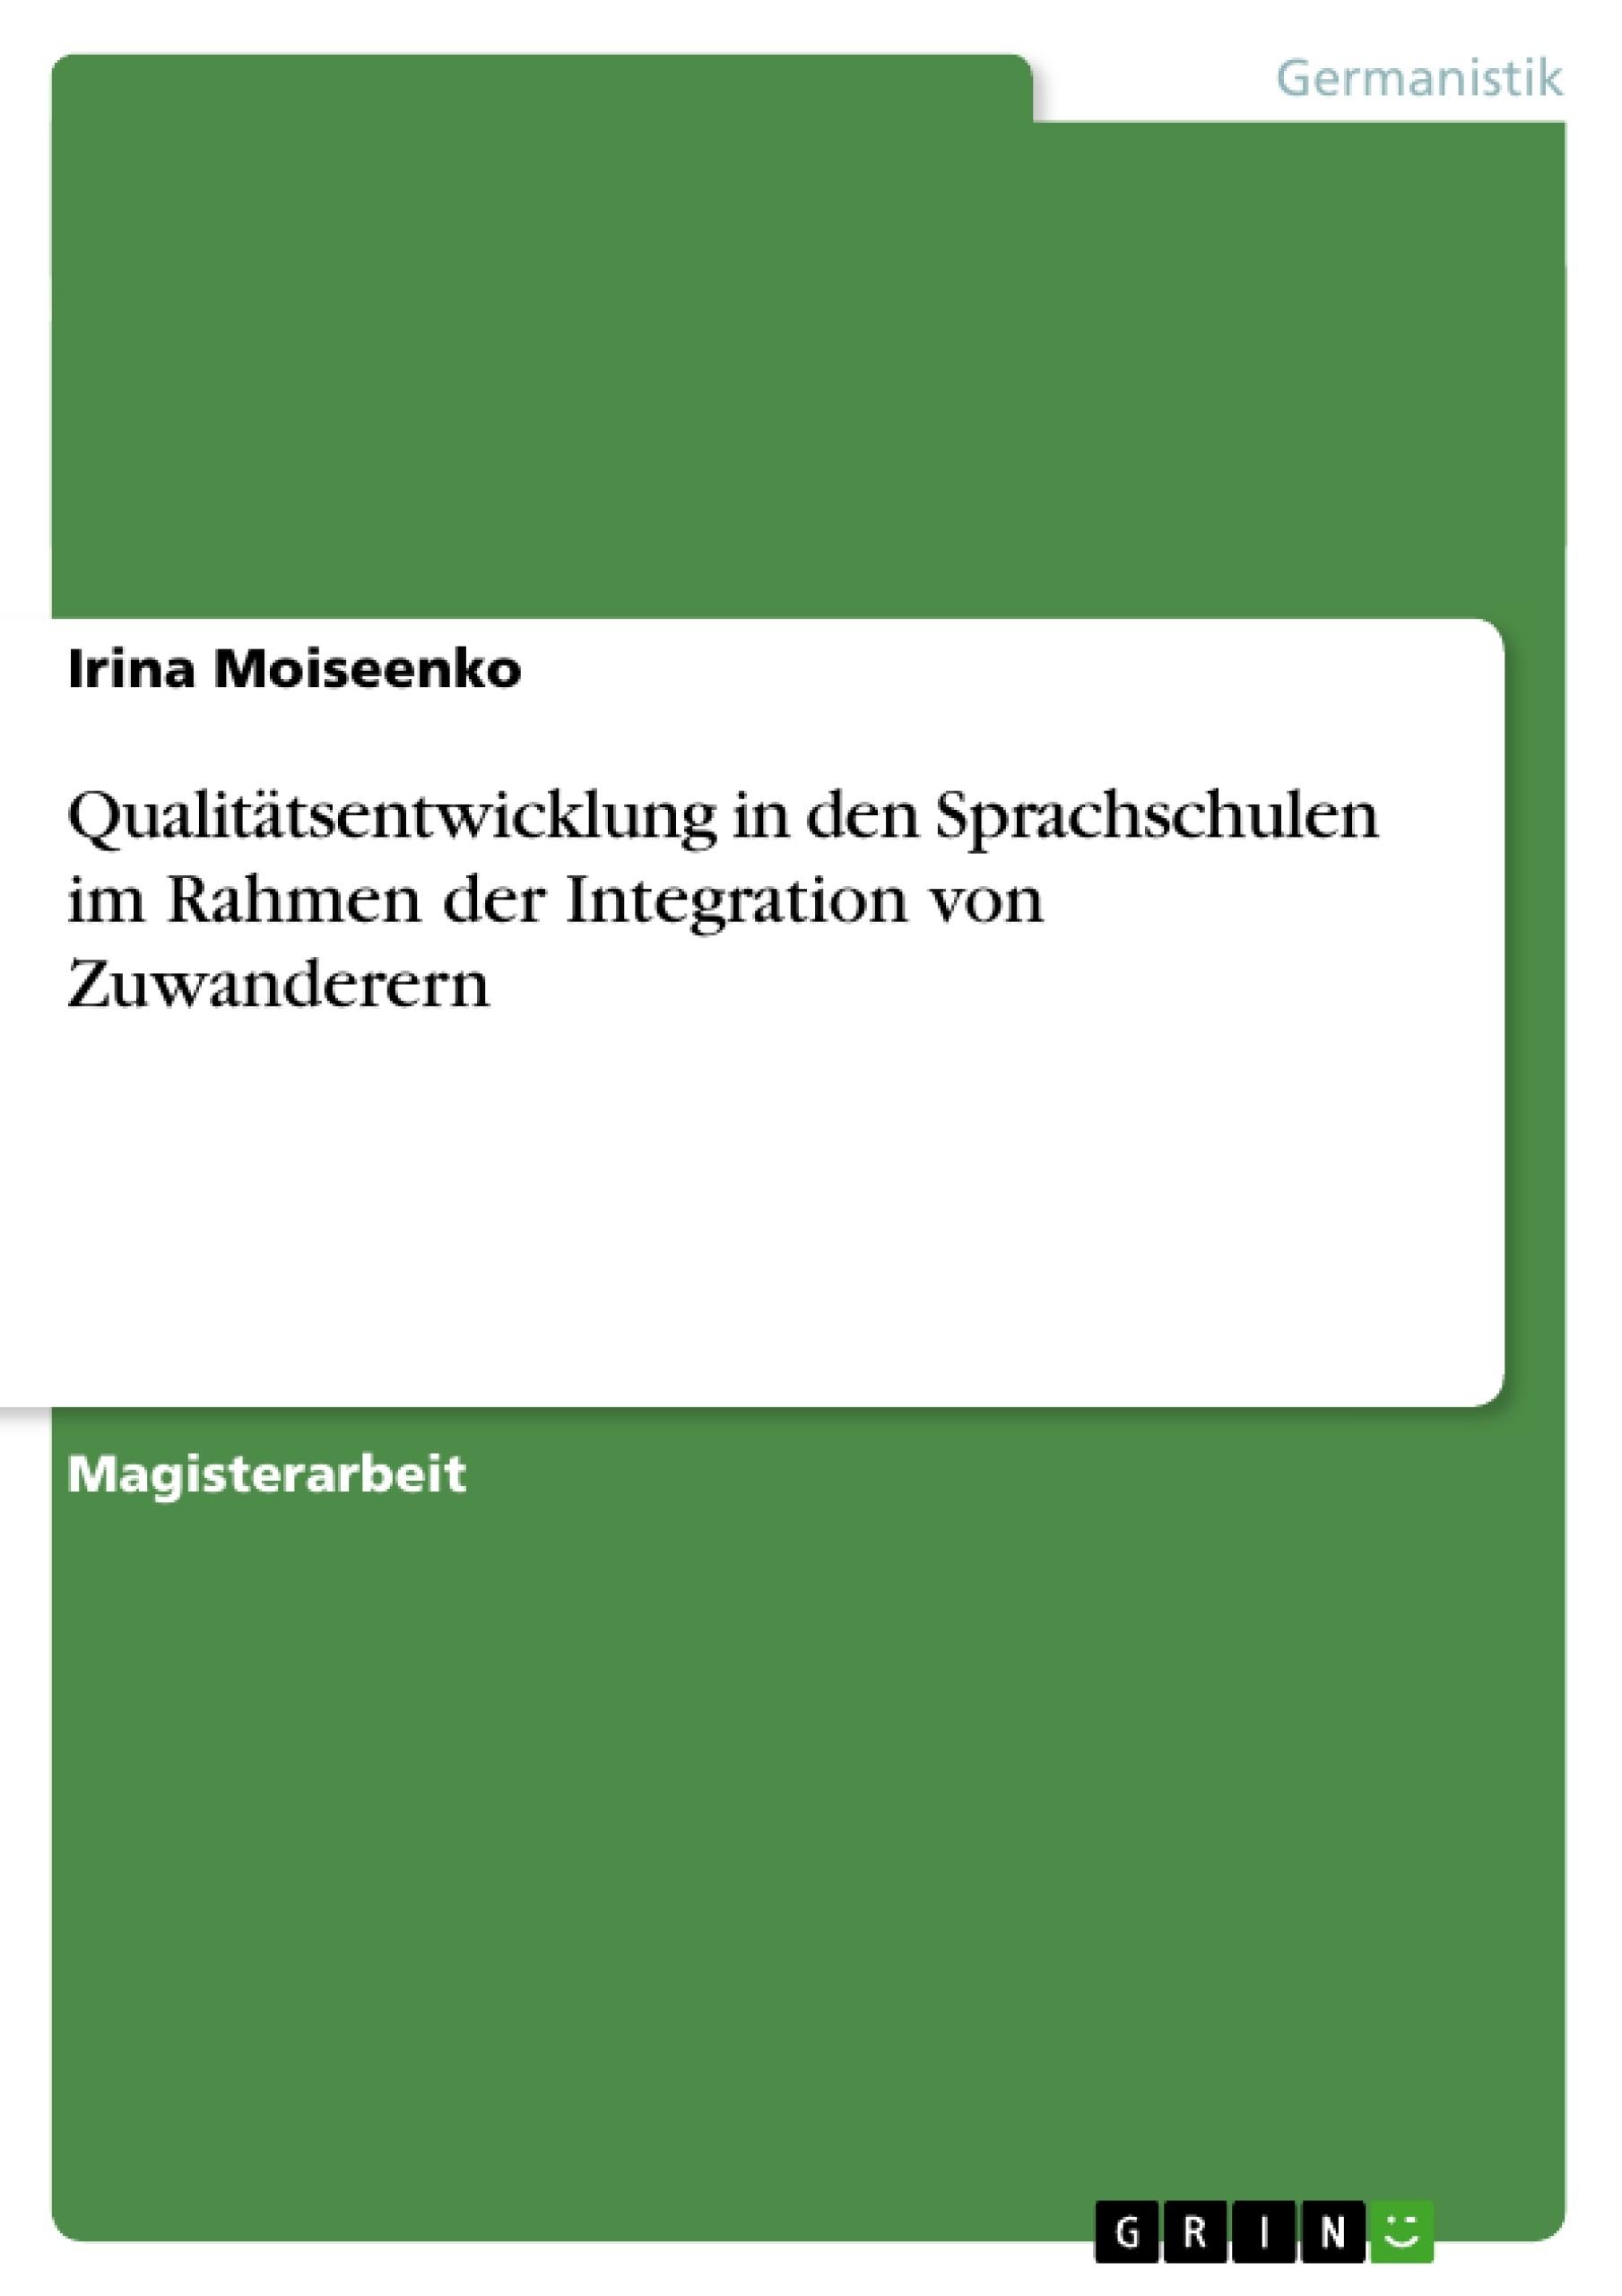 Fein Erhöhung Der Selbstachtung Arbeitsblatt Bilder - Super Lehrer ...